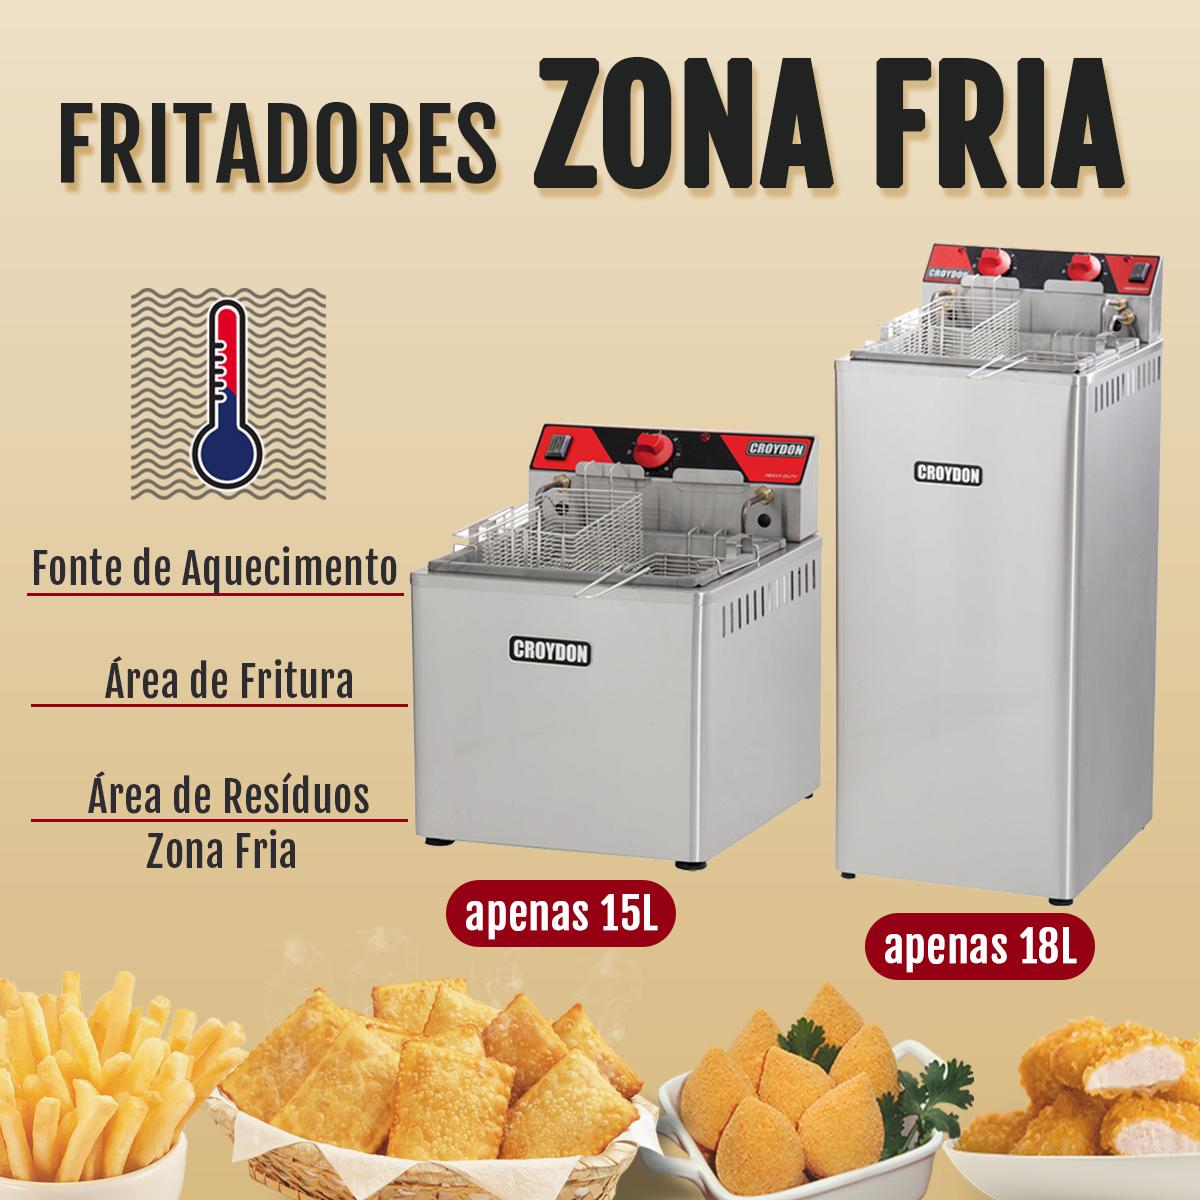 FRITADORES ZONA FRIA